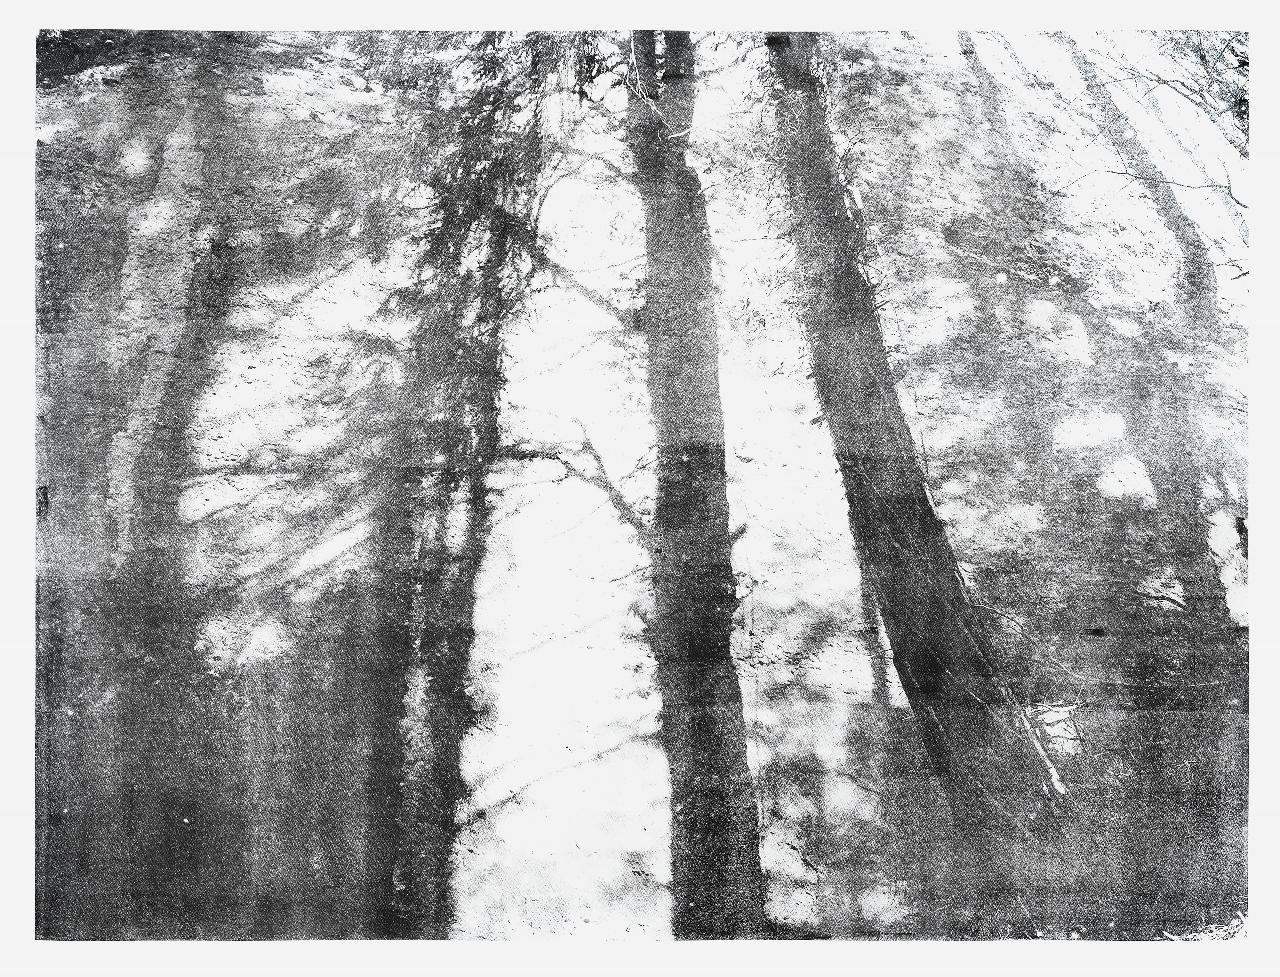 Cécile Wick, Wald III, 2017, Lithographie, 152 x 250 cm. © Cécile Wick